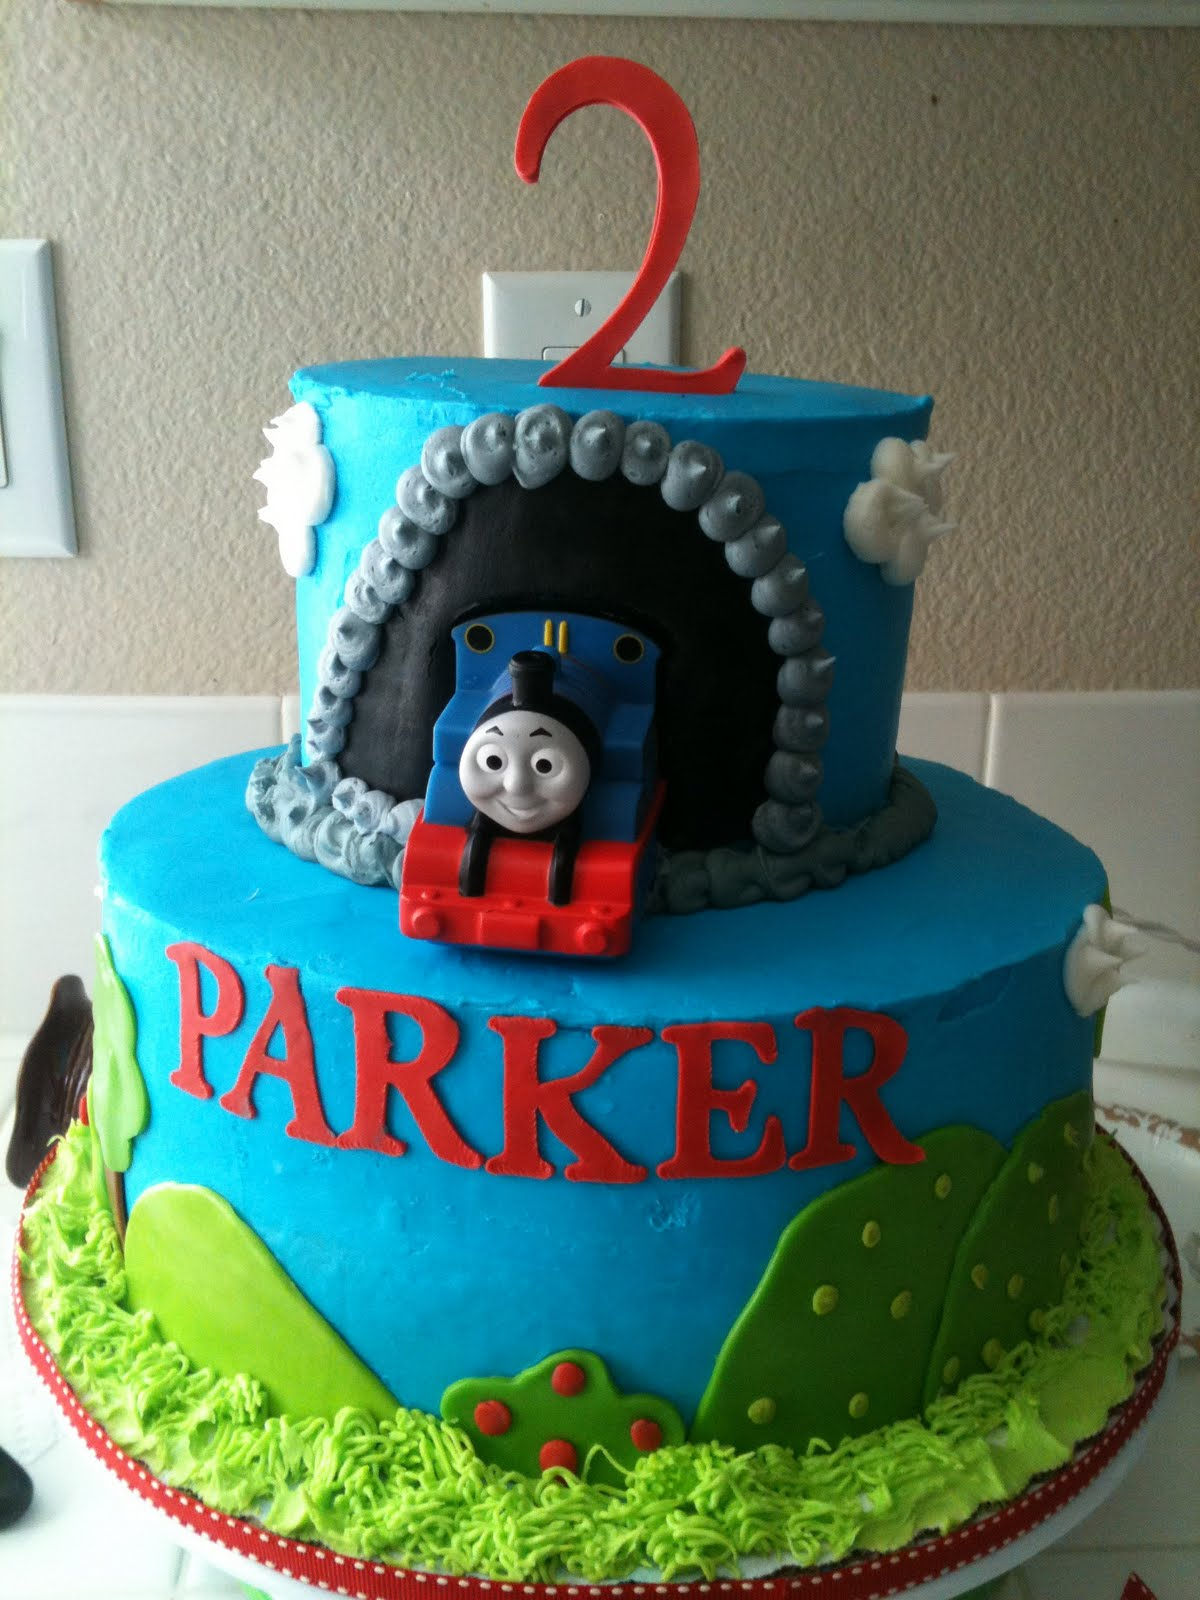 Custom Cookies Cupcakes And Cake Cakes Amp Cupcakes